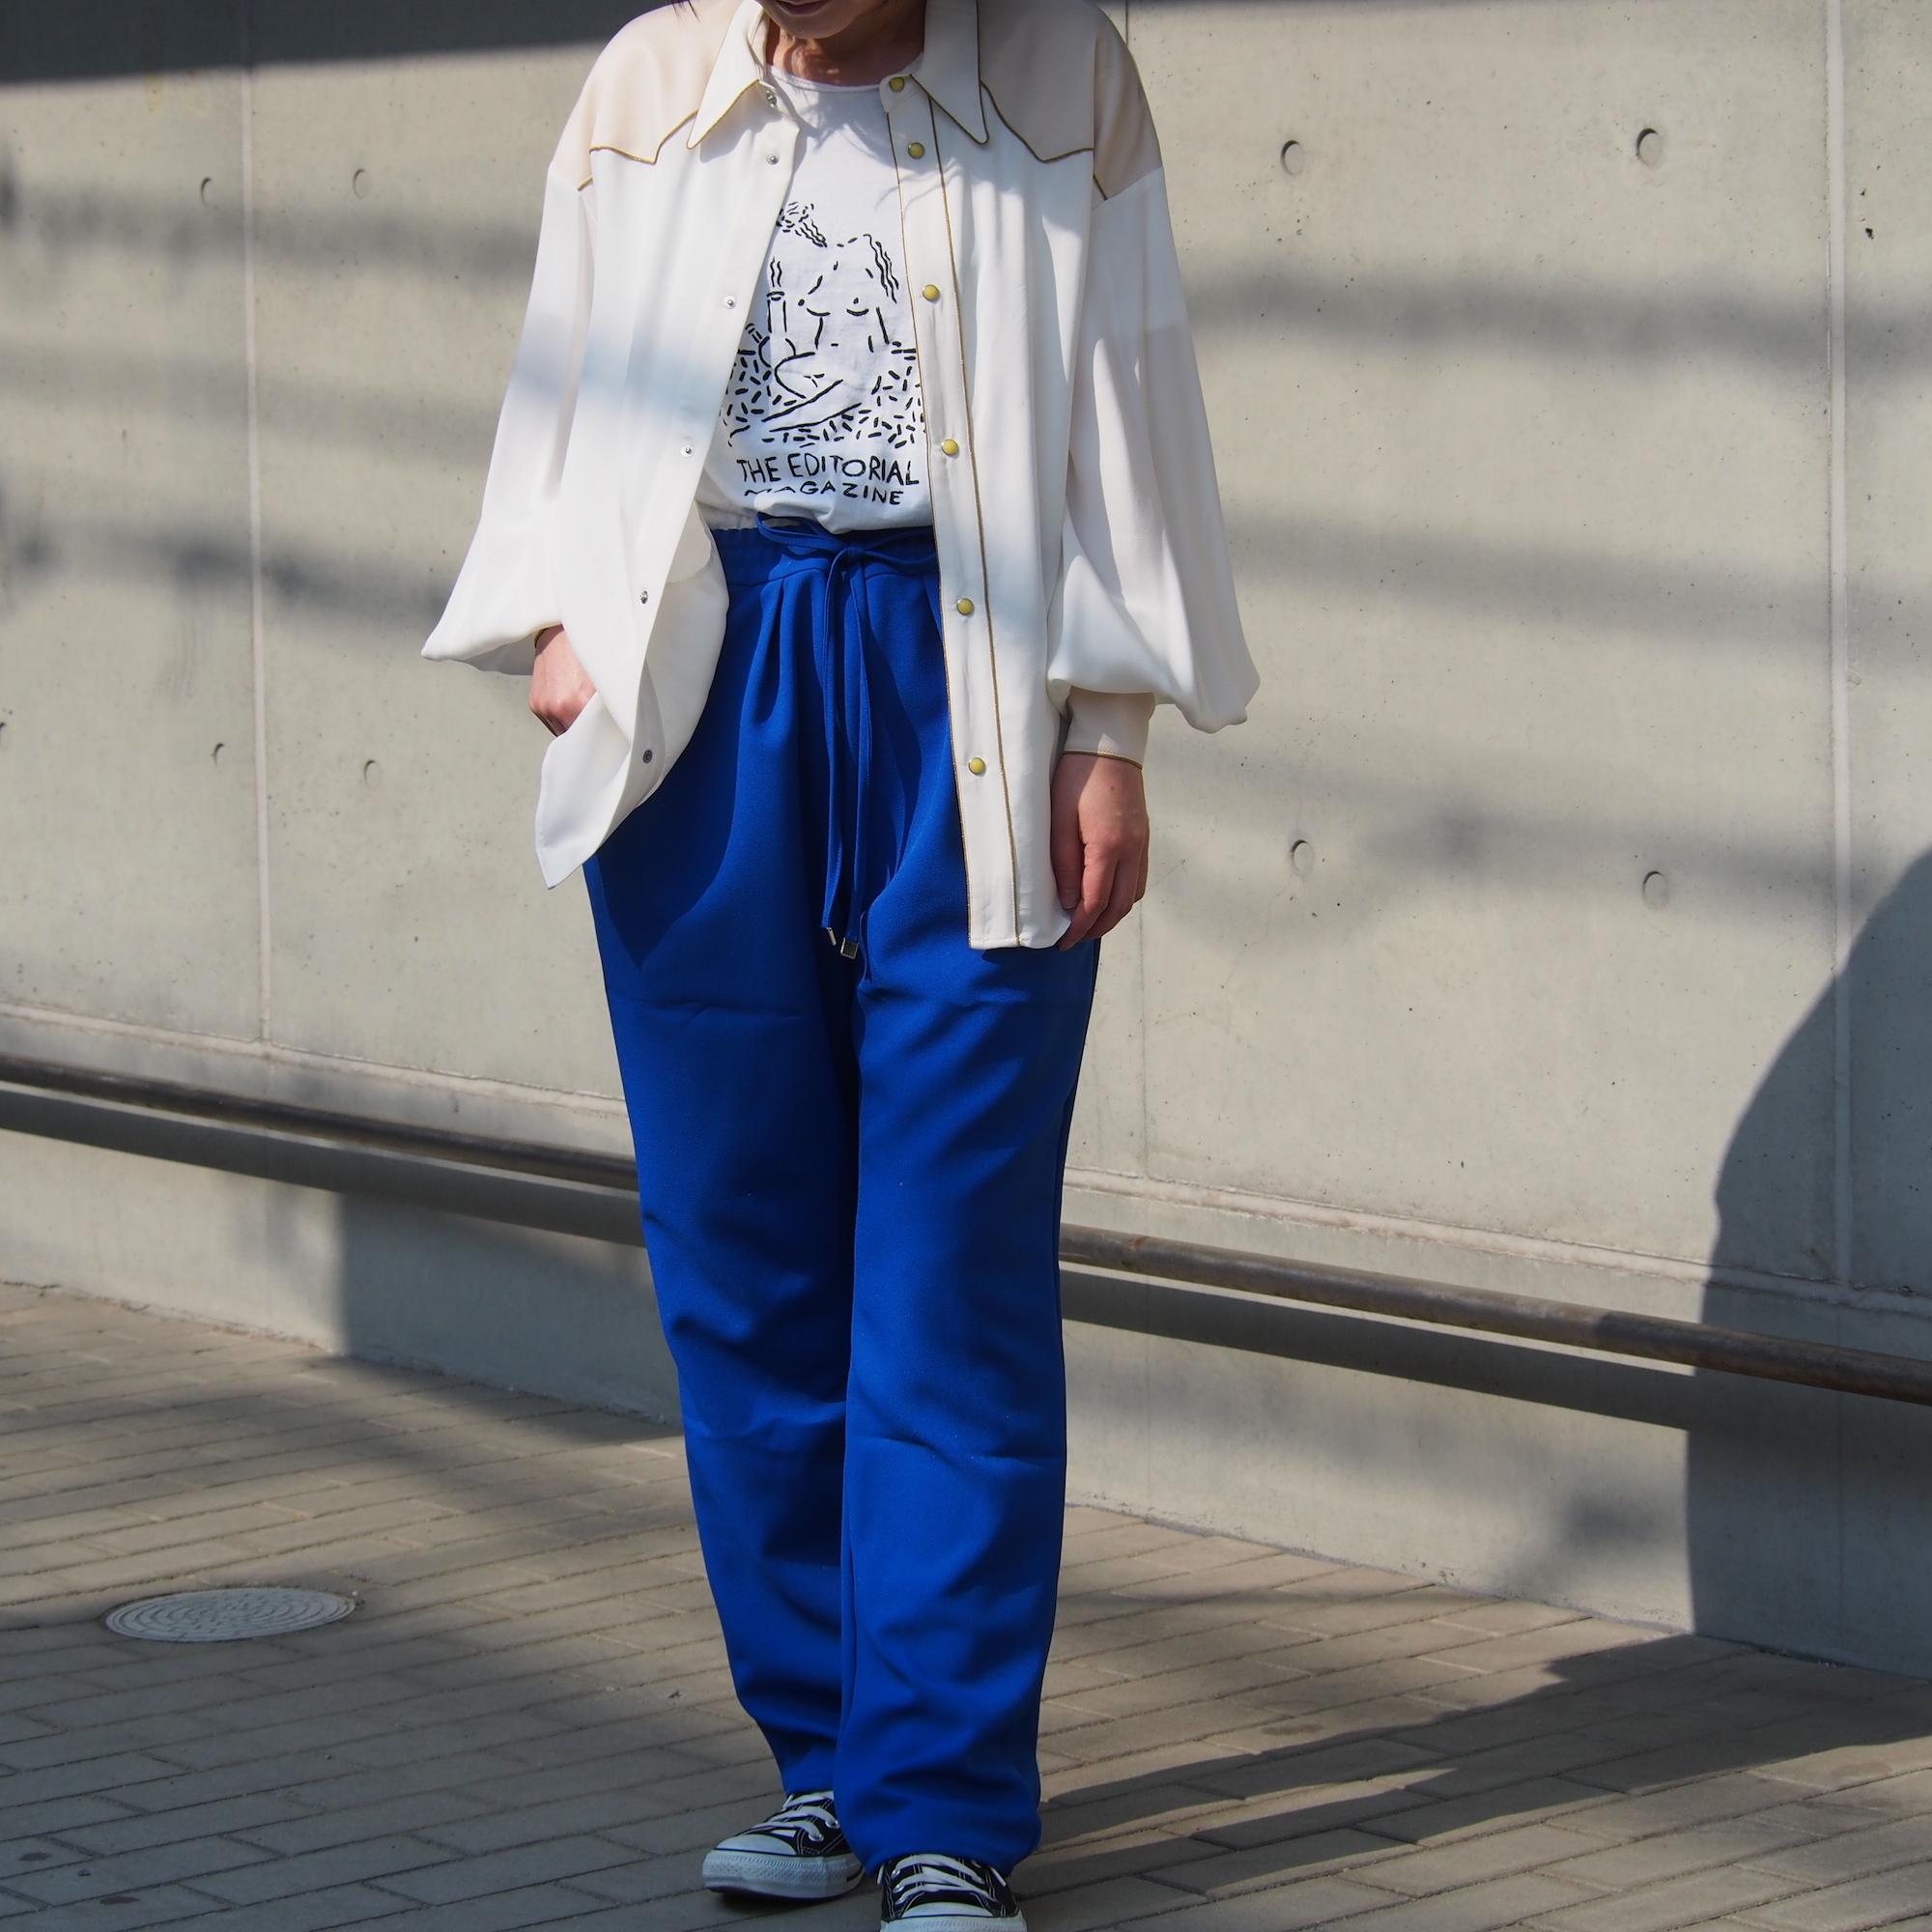 【ethical hippi】tapered pants(sky blue) / 【エシカル ヒッピ】テーパード パンツ(スカイ ブルー)